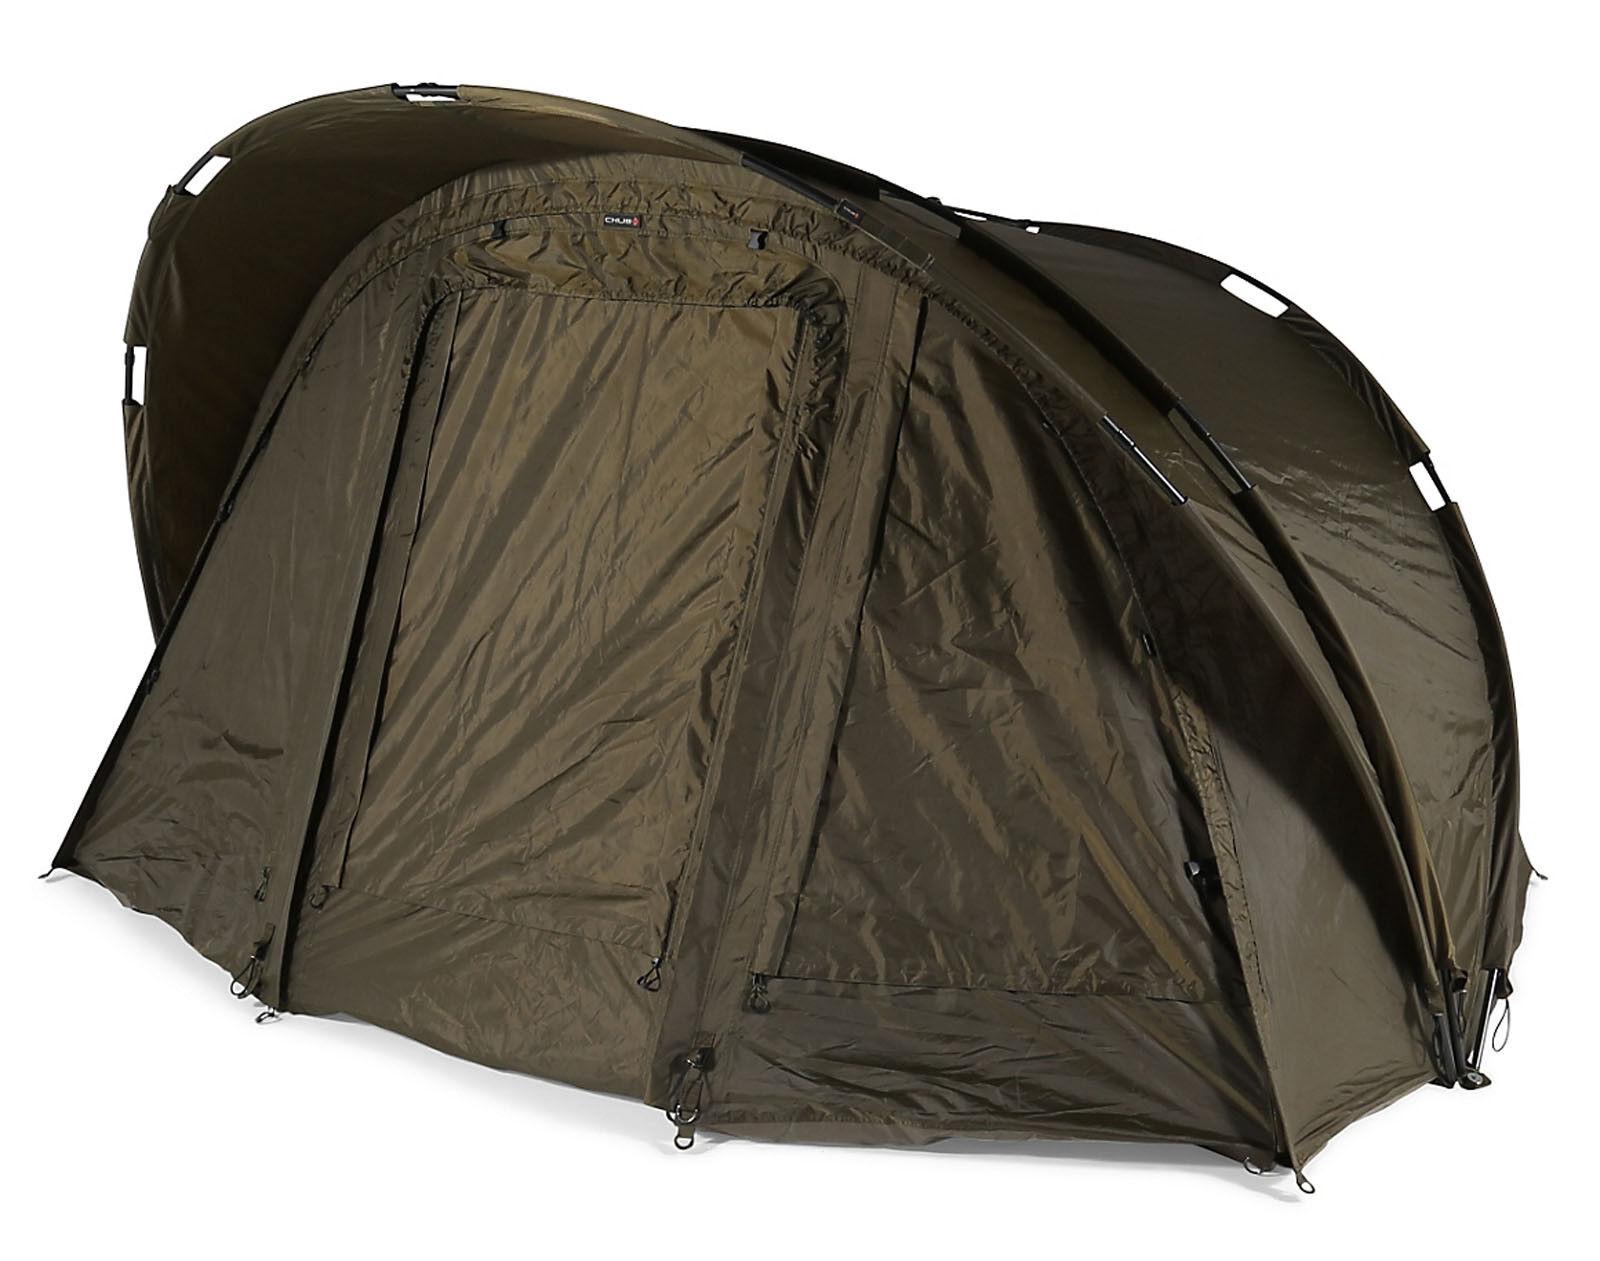 New 2018 Chub 1 & 2 Man All Weather Outkast Bivvy Carp Coarse Fishing Shelter